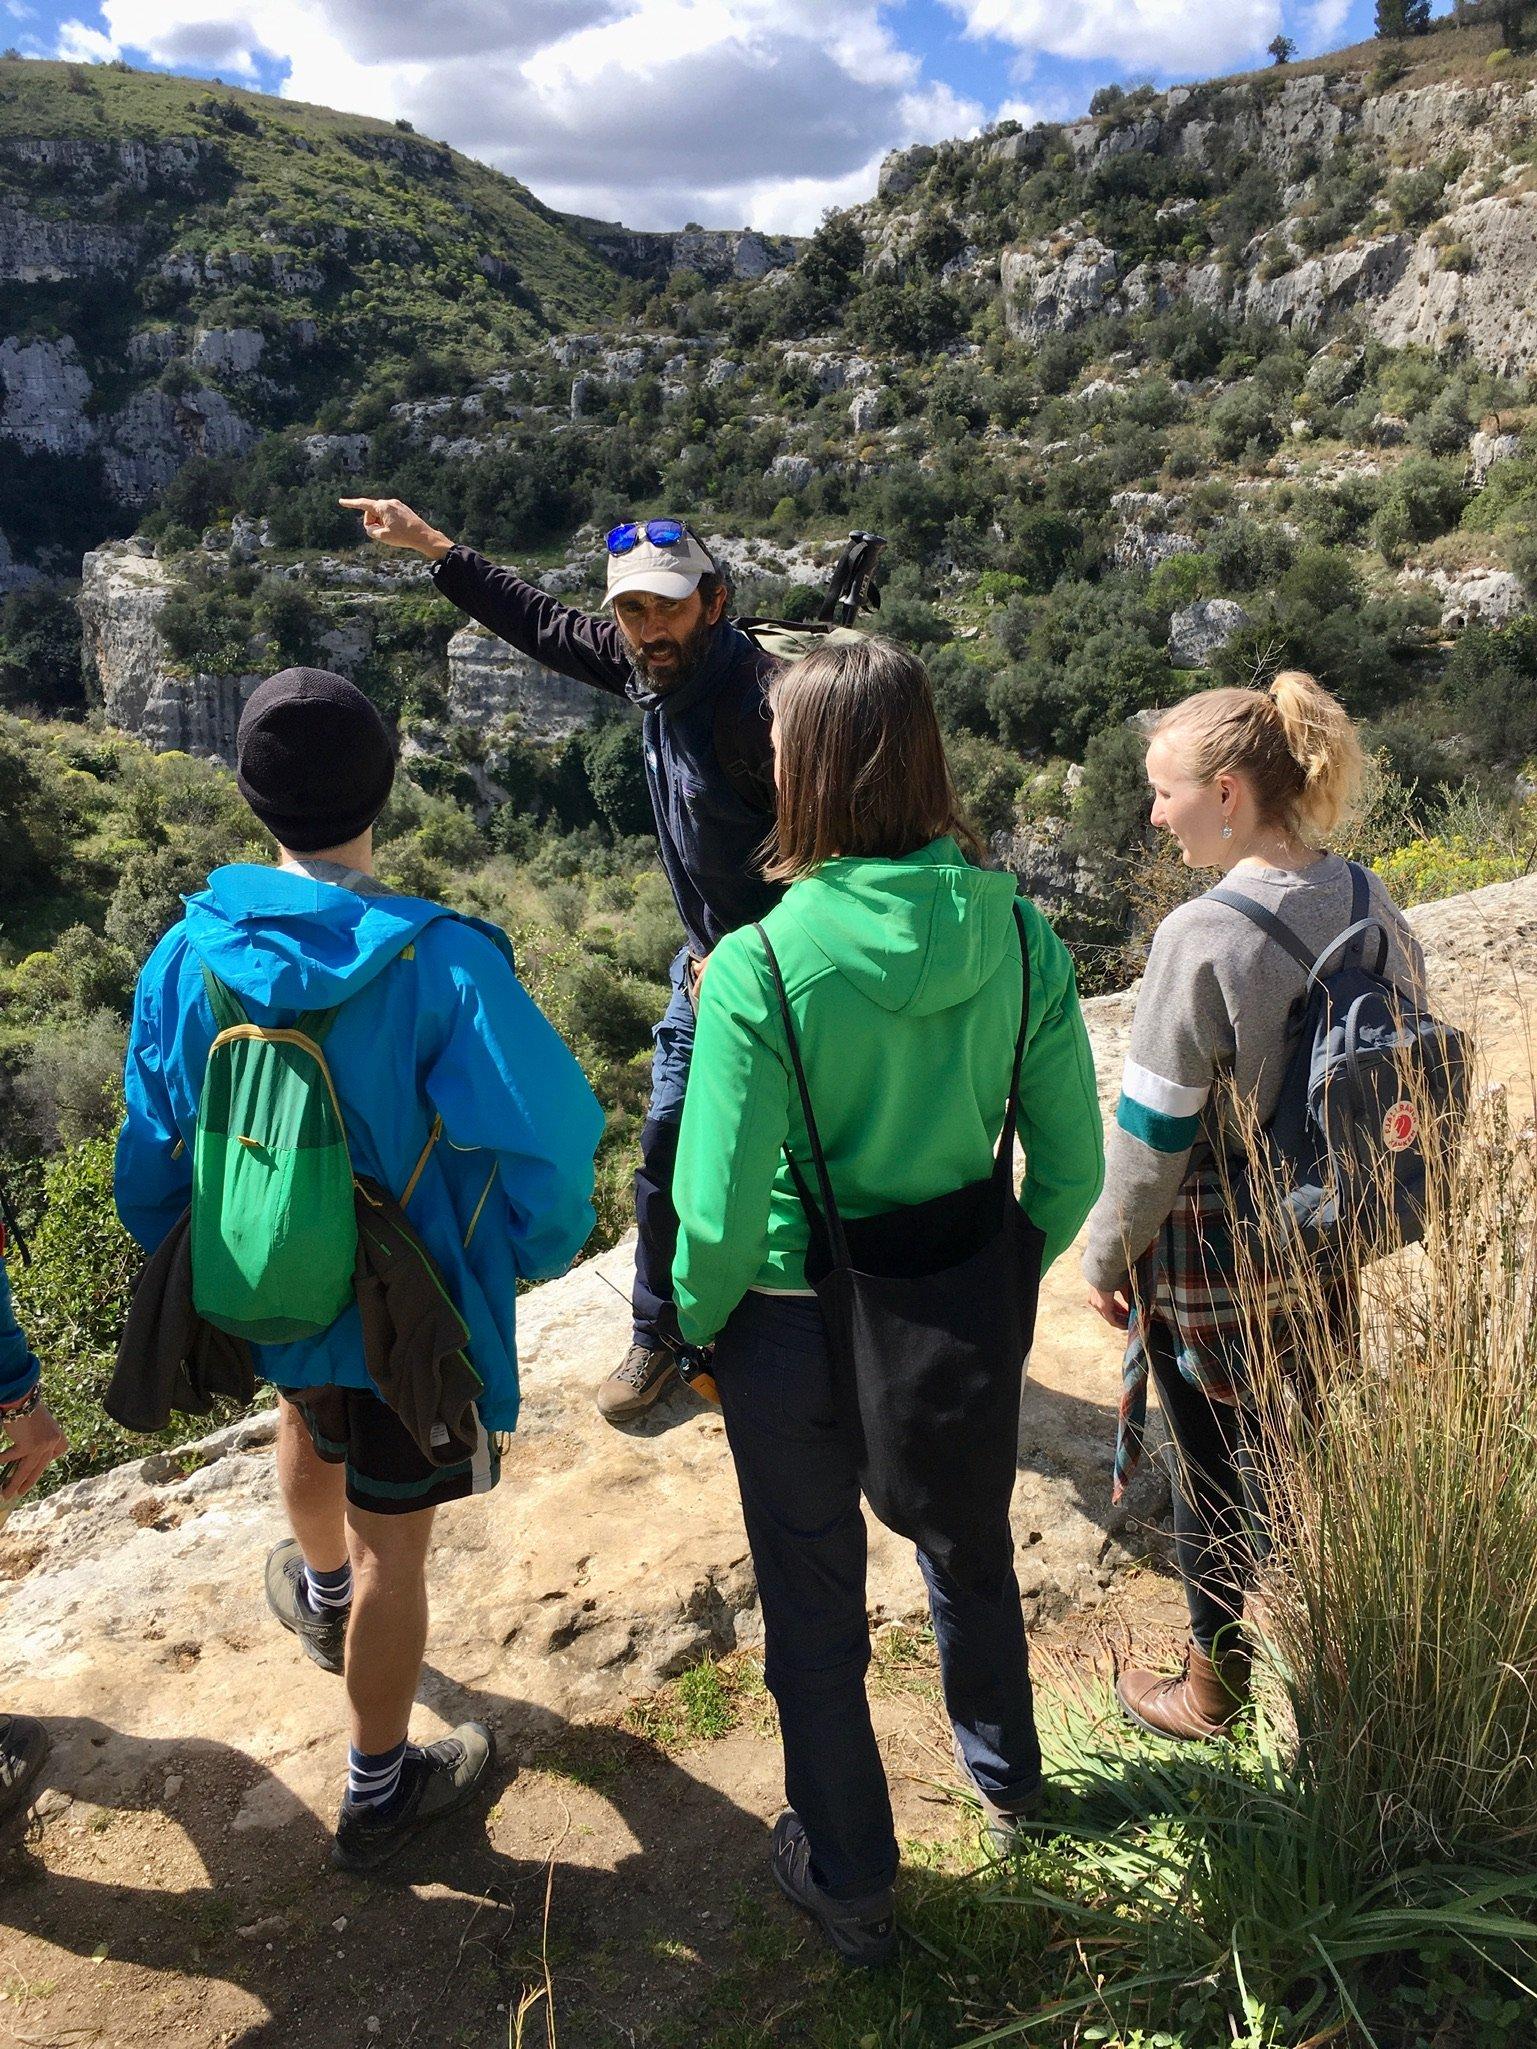 Wanderung im Naturreservat Pantalica